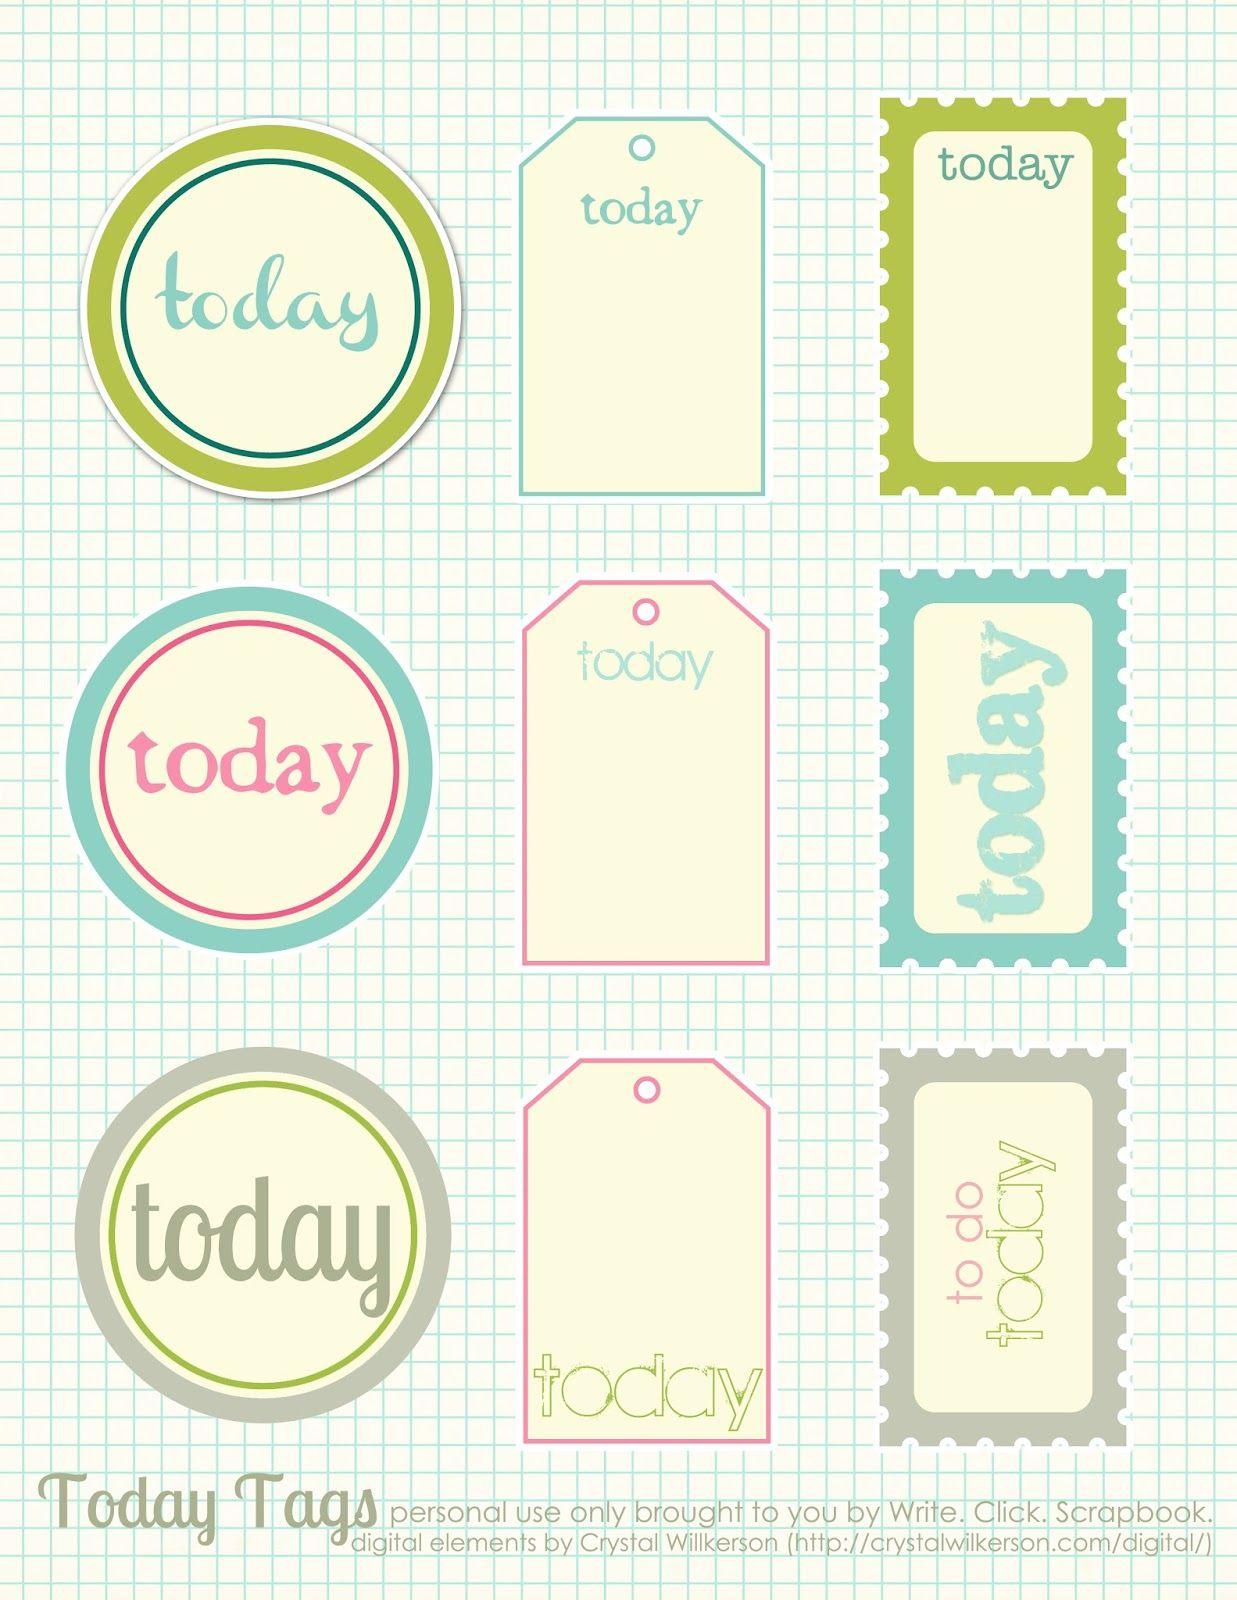 Free Printable Scrapbook Cutouts | Printable For All Topics - Free Printable Scrapbook Page Designs